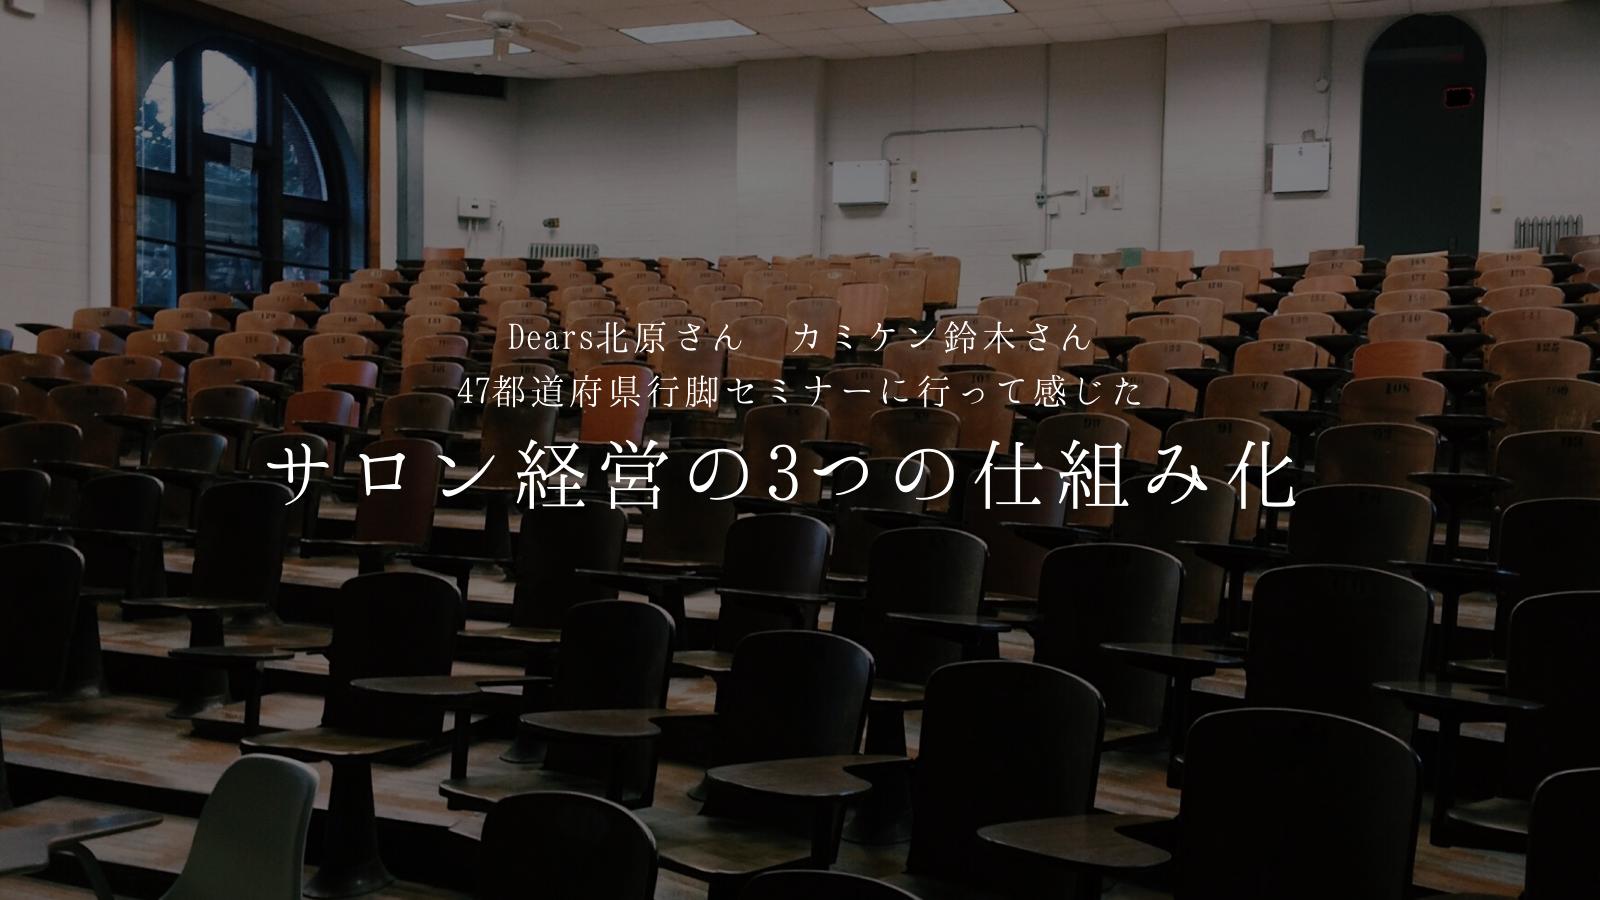 Dears北原さんとカミケン鈴木さんのセミナーに行って感じたサロン経営3つの仕組み化